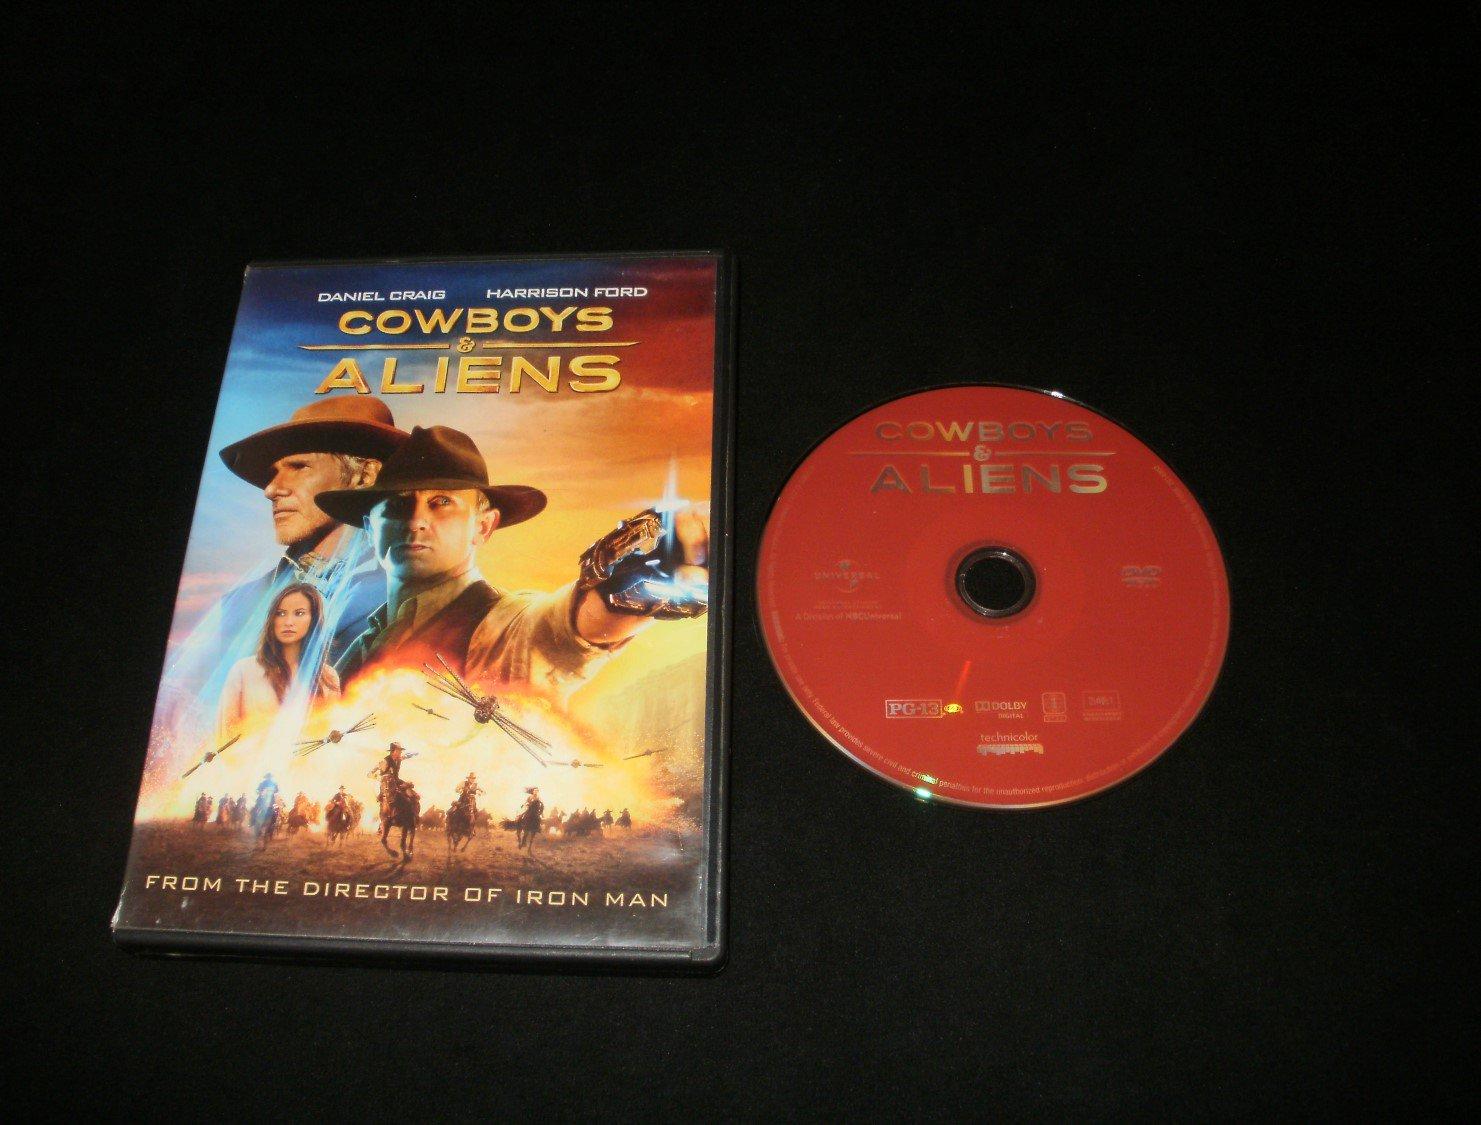 Cowboys & Aliens - DVD 2011 - Harrison Ford and Daniel Craig